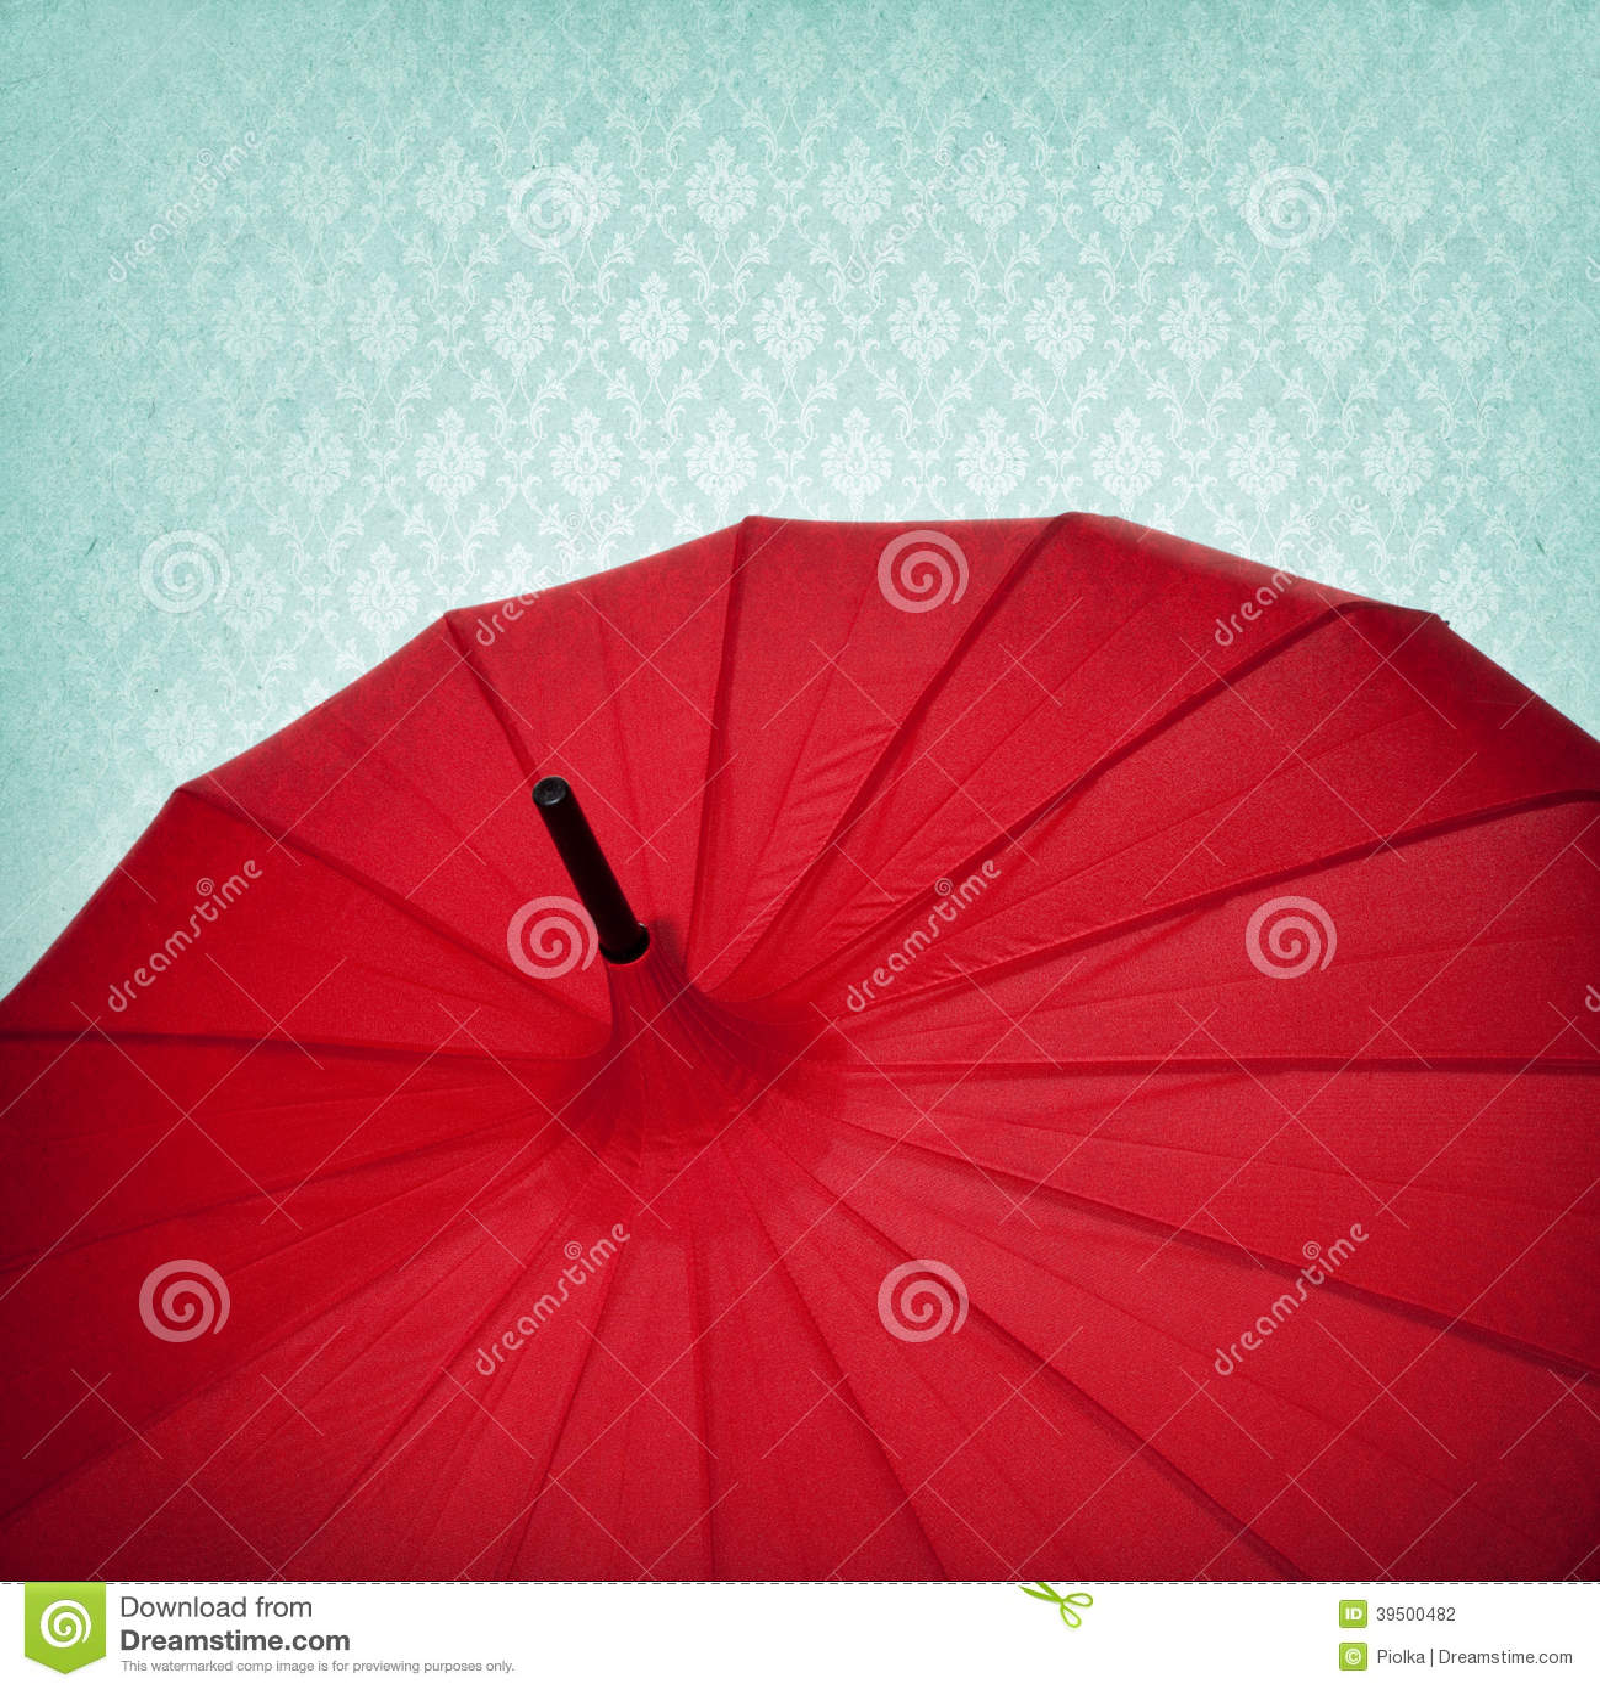 Red Umbrella Background